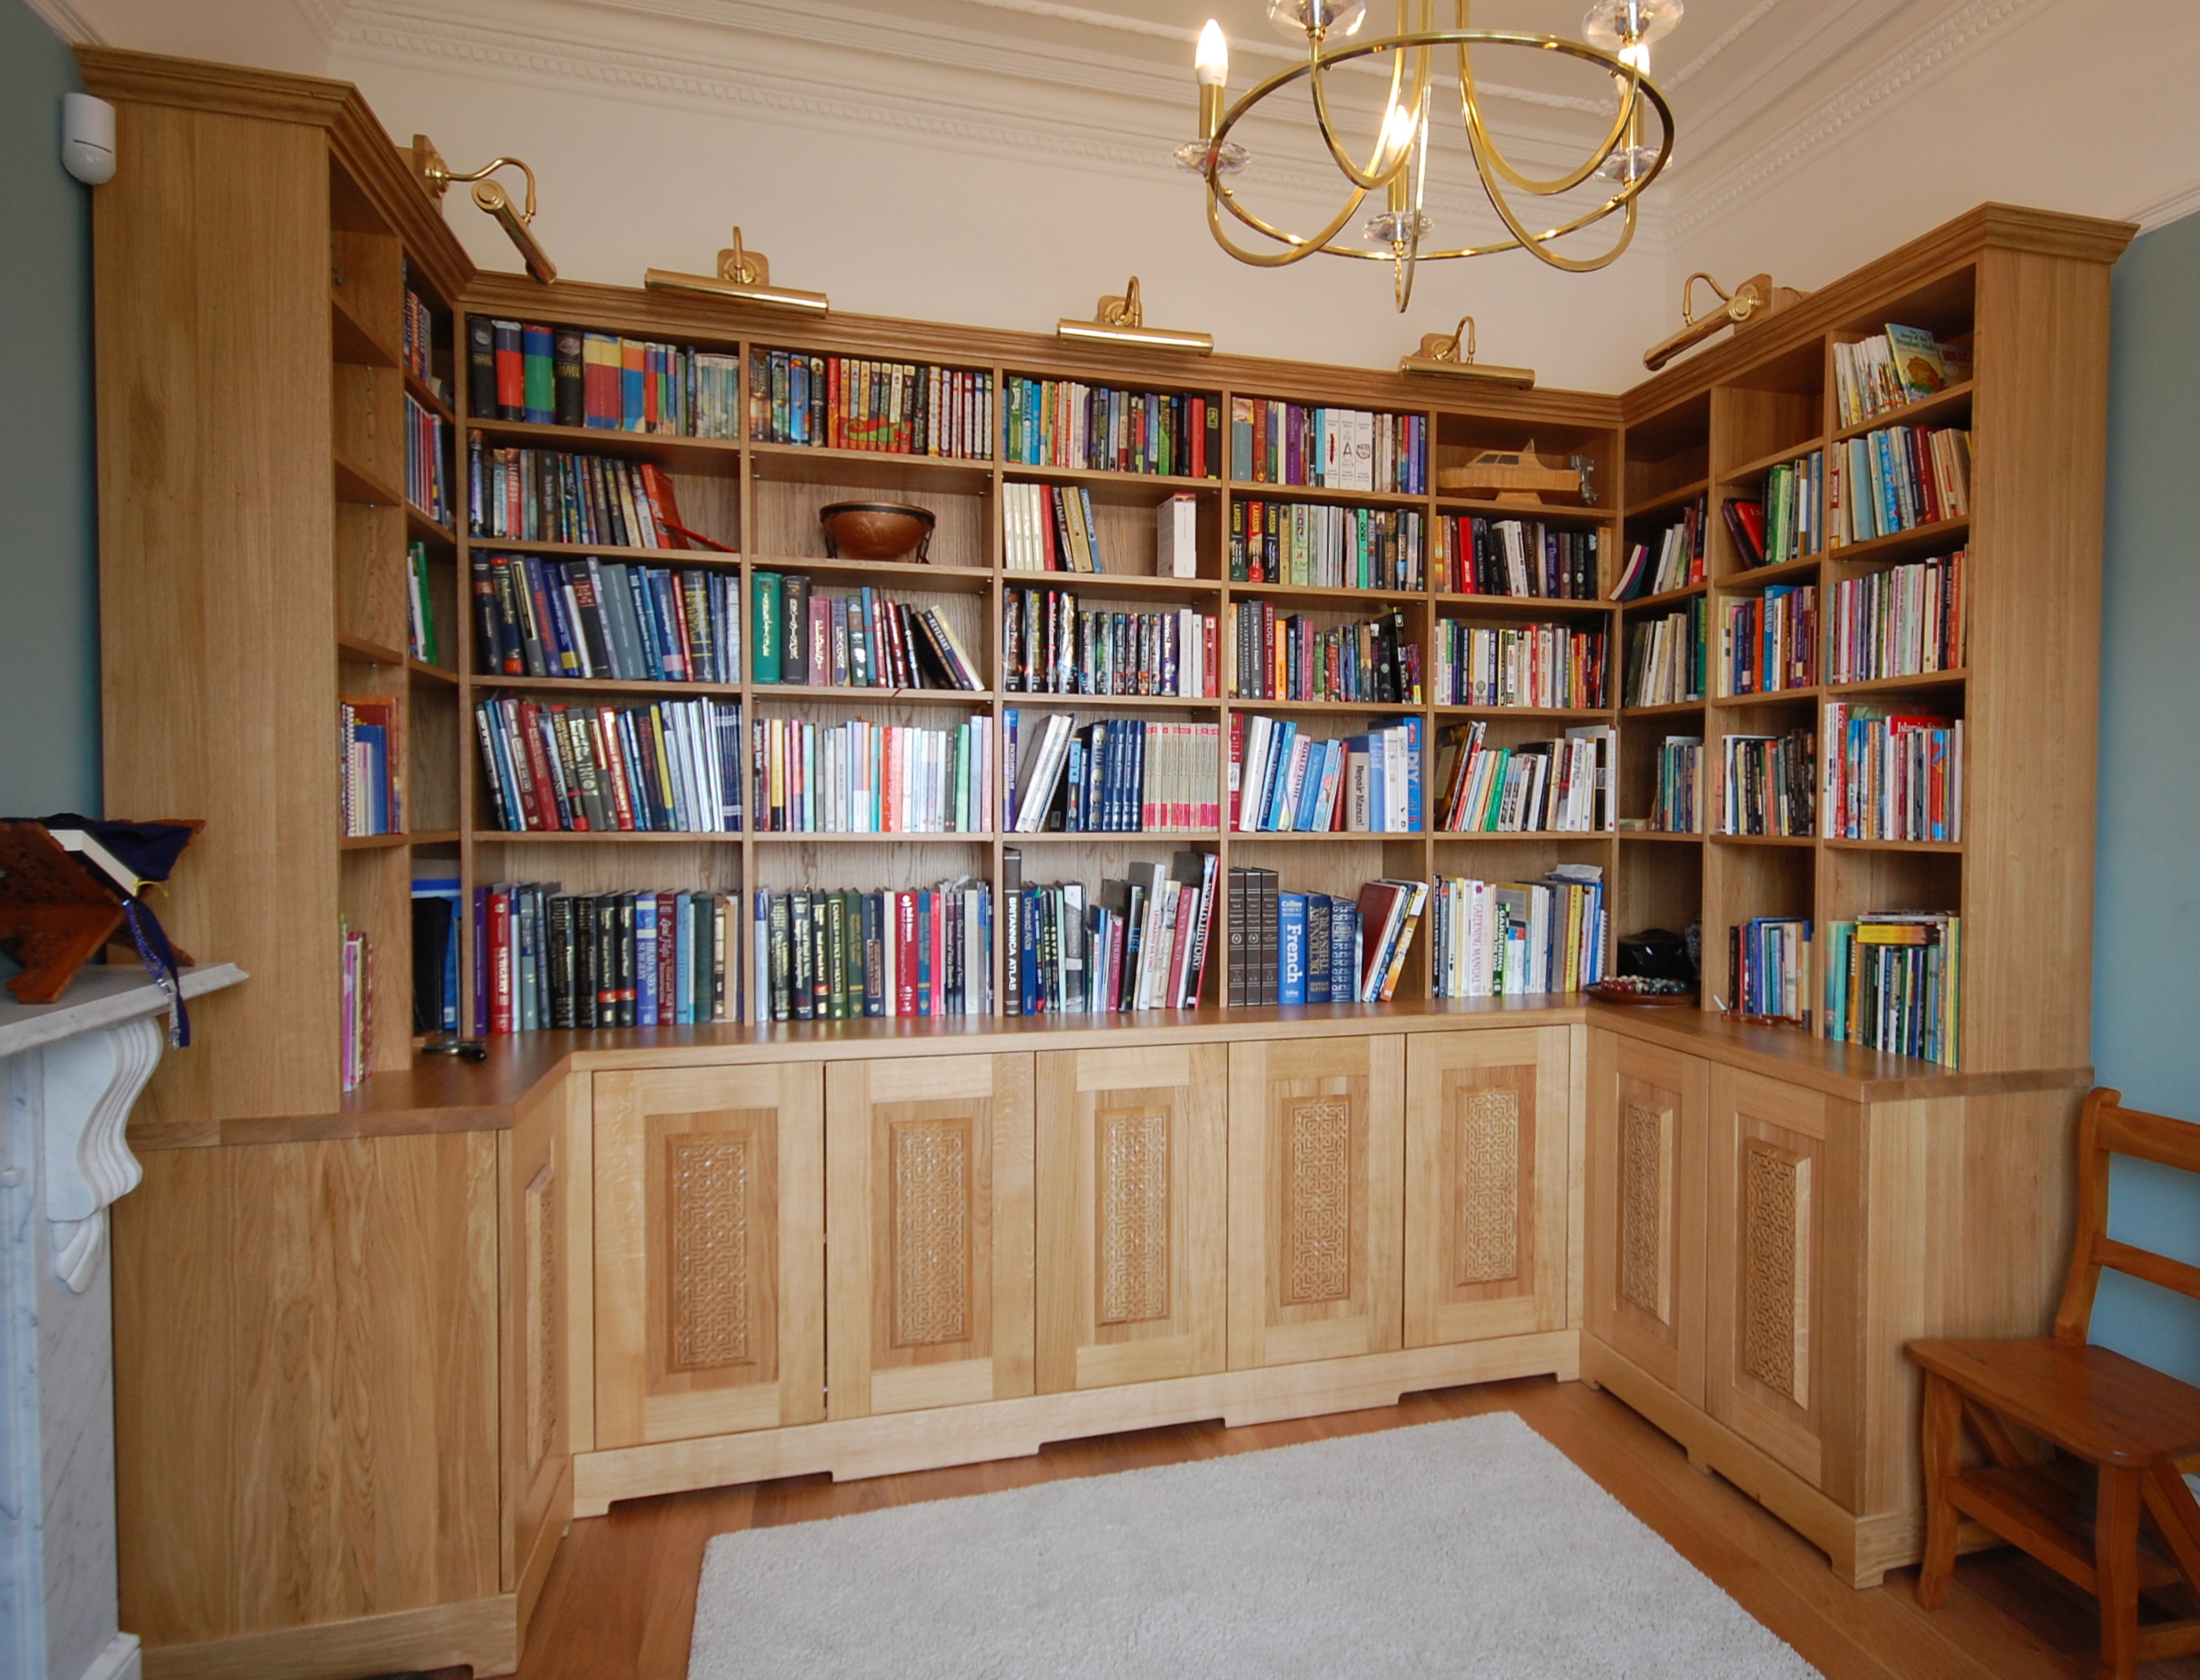 Grain_Bespoke_Furniture_Solid_Oak_Library.jpg